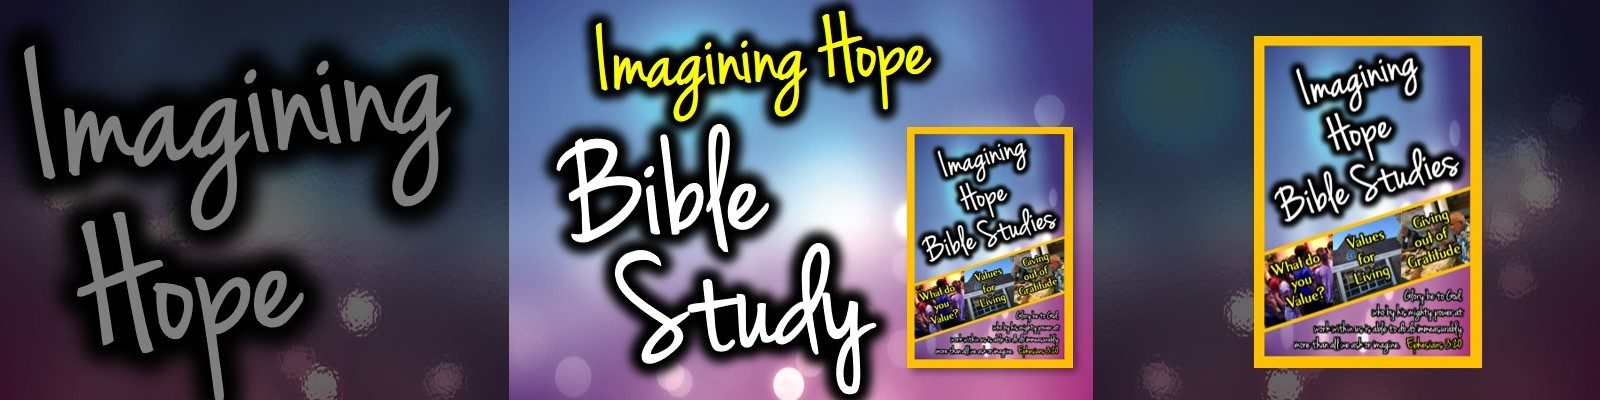 Imagining Hope Bible Study